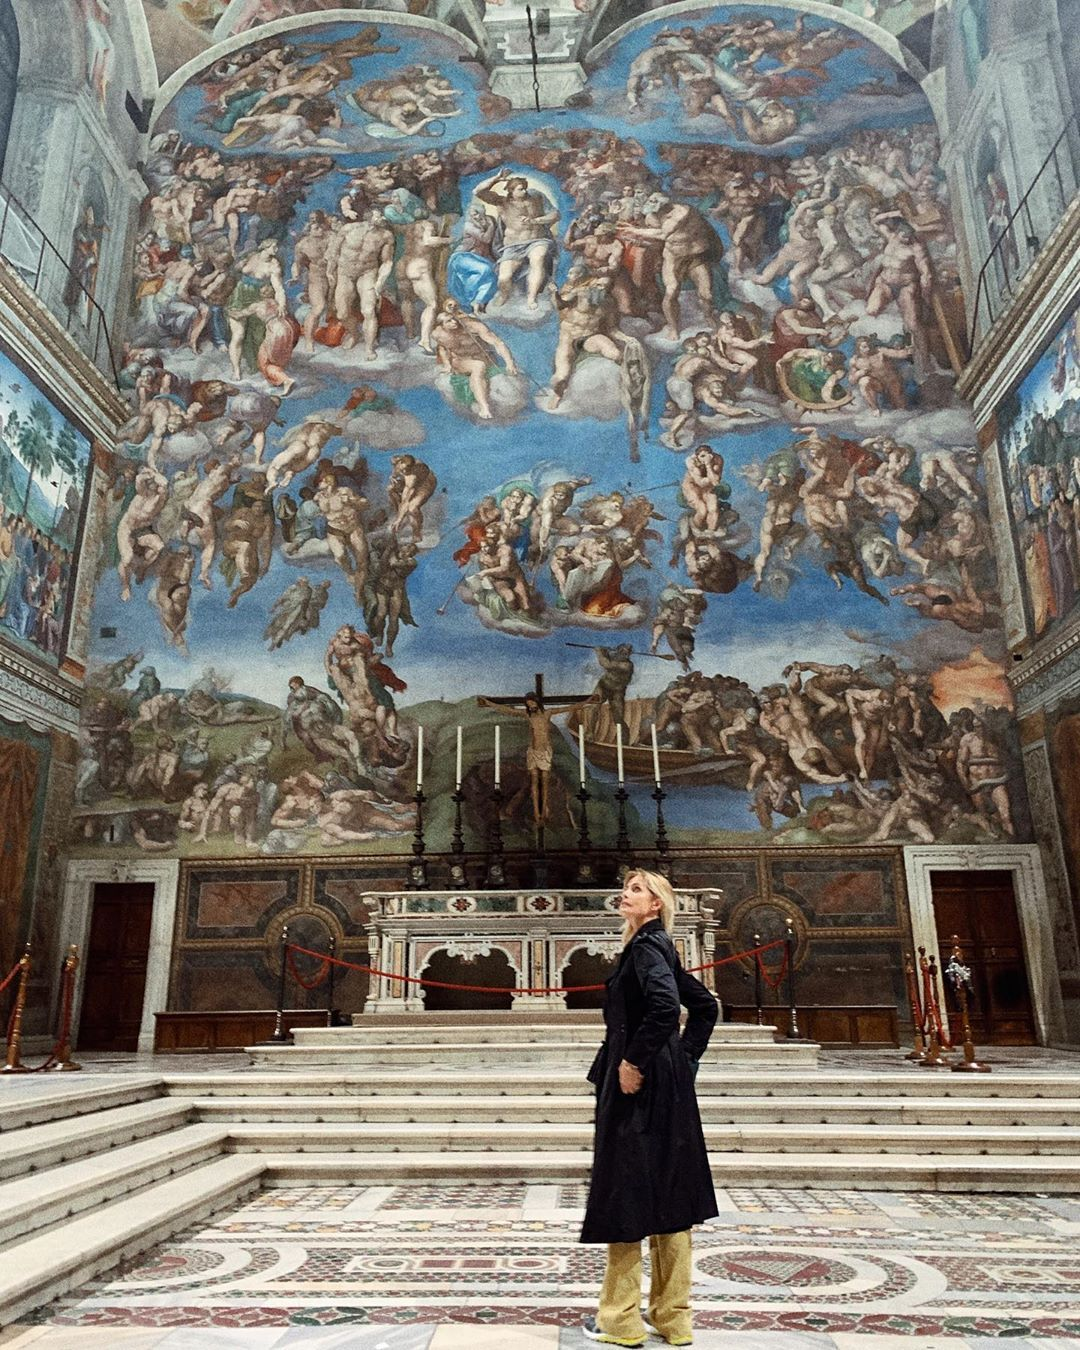 celebrity ai musei vaticani - neomag.